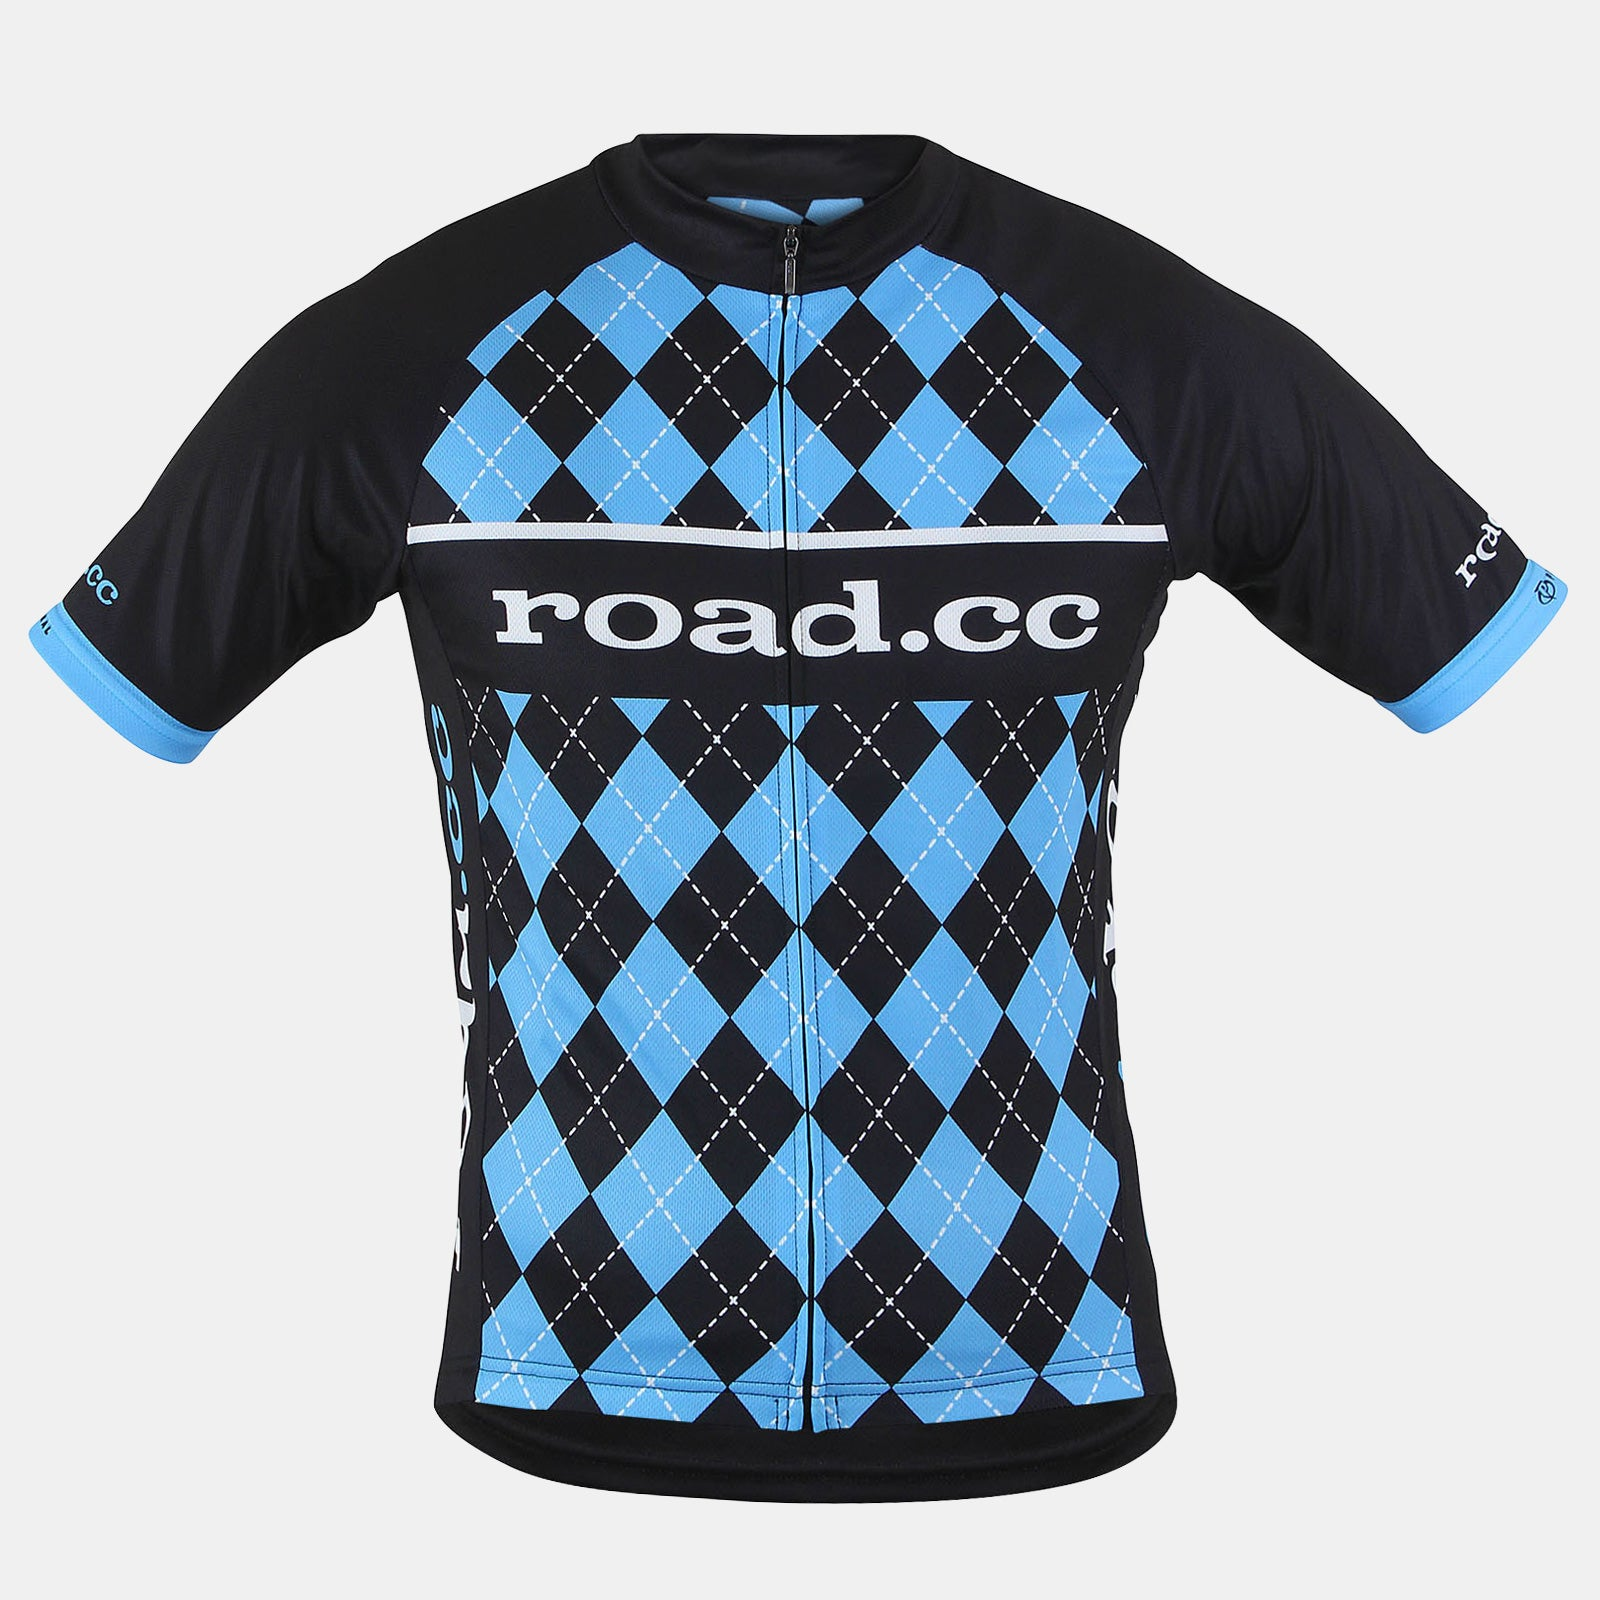 road.cc Men's Evo jersey